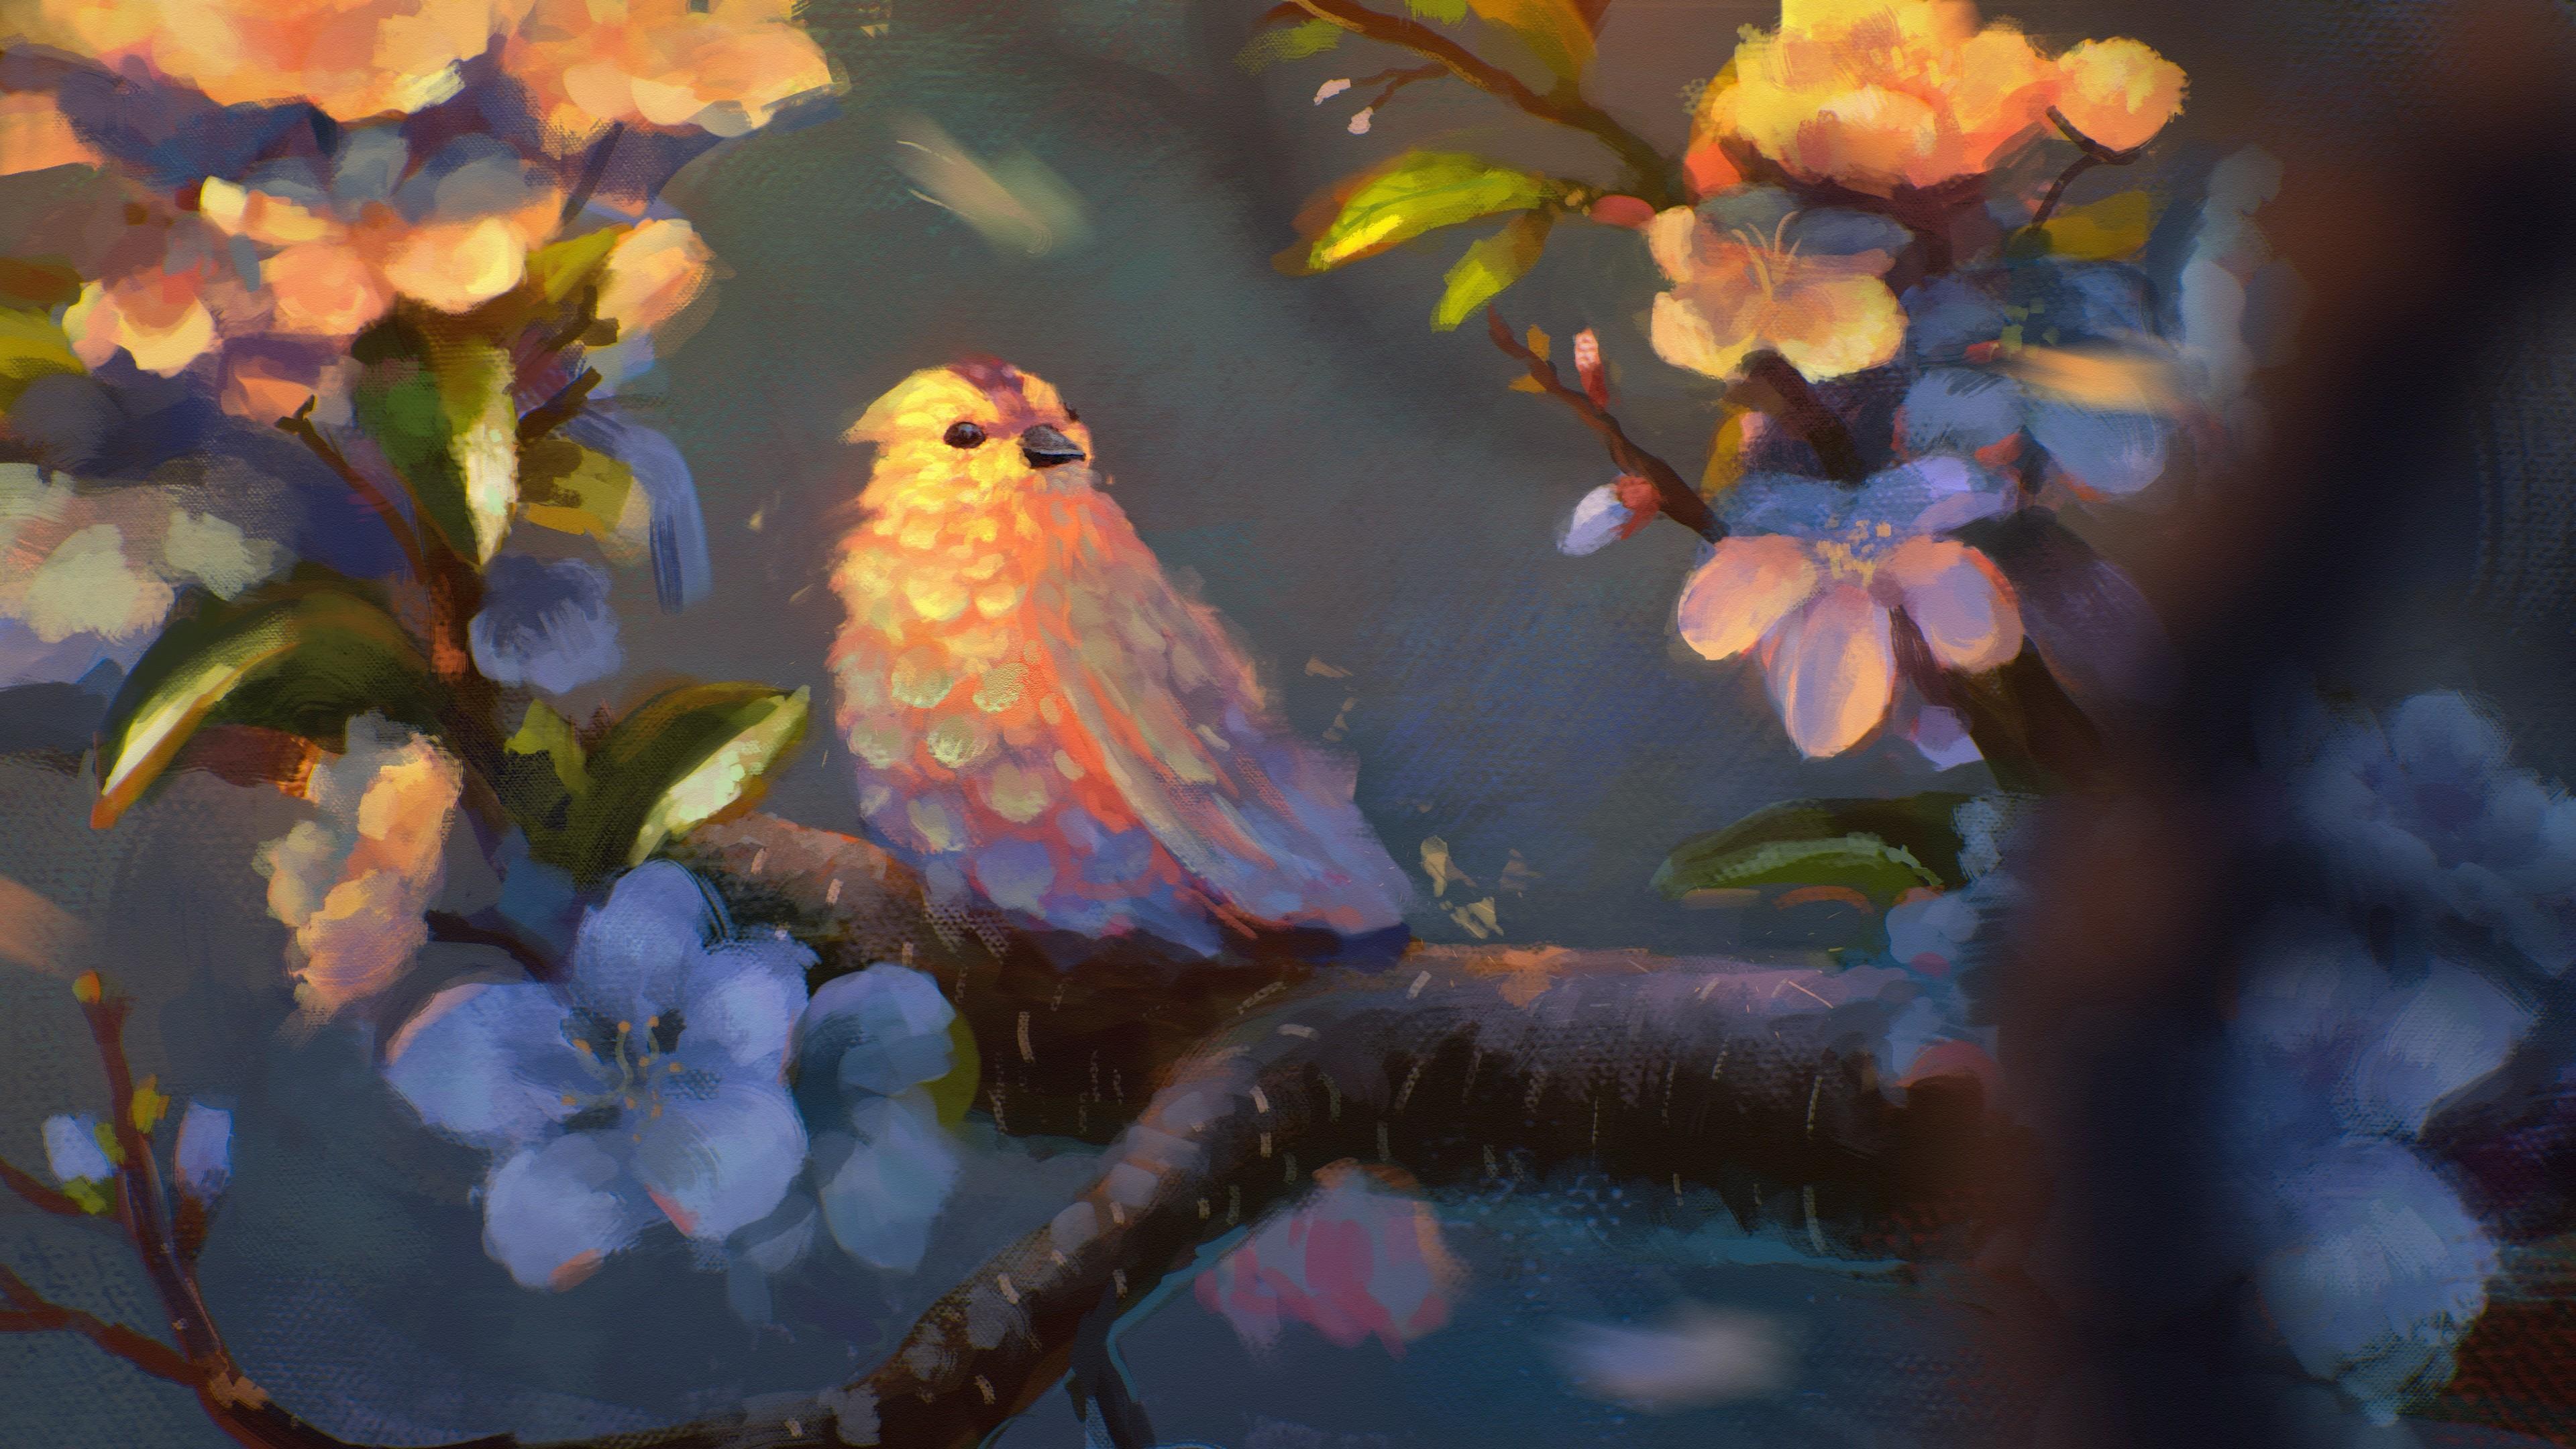 bird painting 4k 1540751375 - Bird Painting 4k - painting wallpapers, hd-wallpapers, digital art wallpapers, bird wallpapers, artwork wallpapers, artist wallpapers, 5k wallpapers, 4k-wallpapers